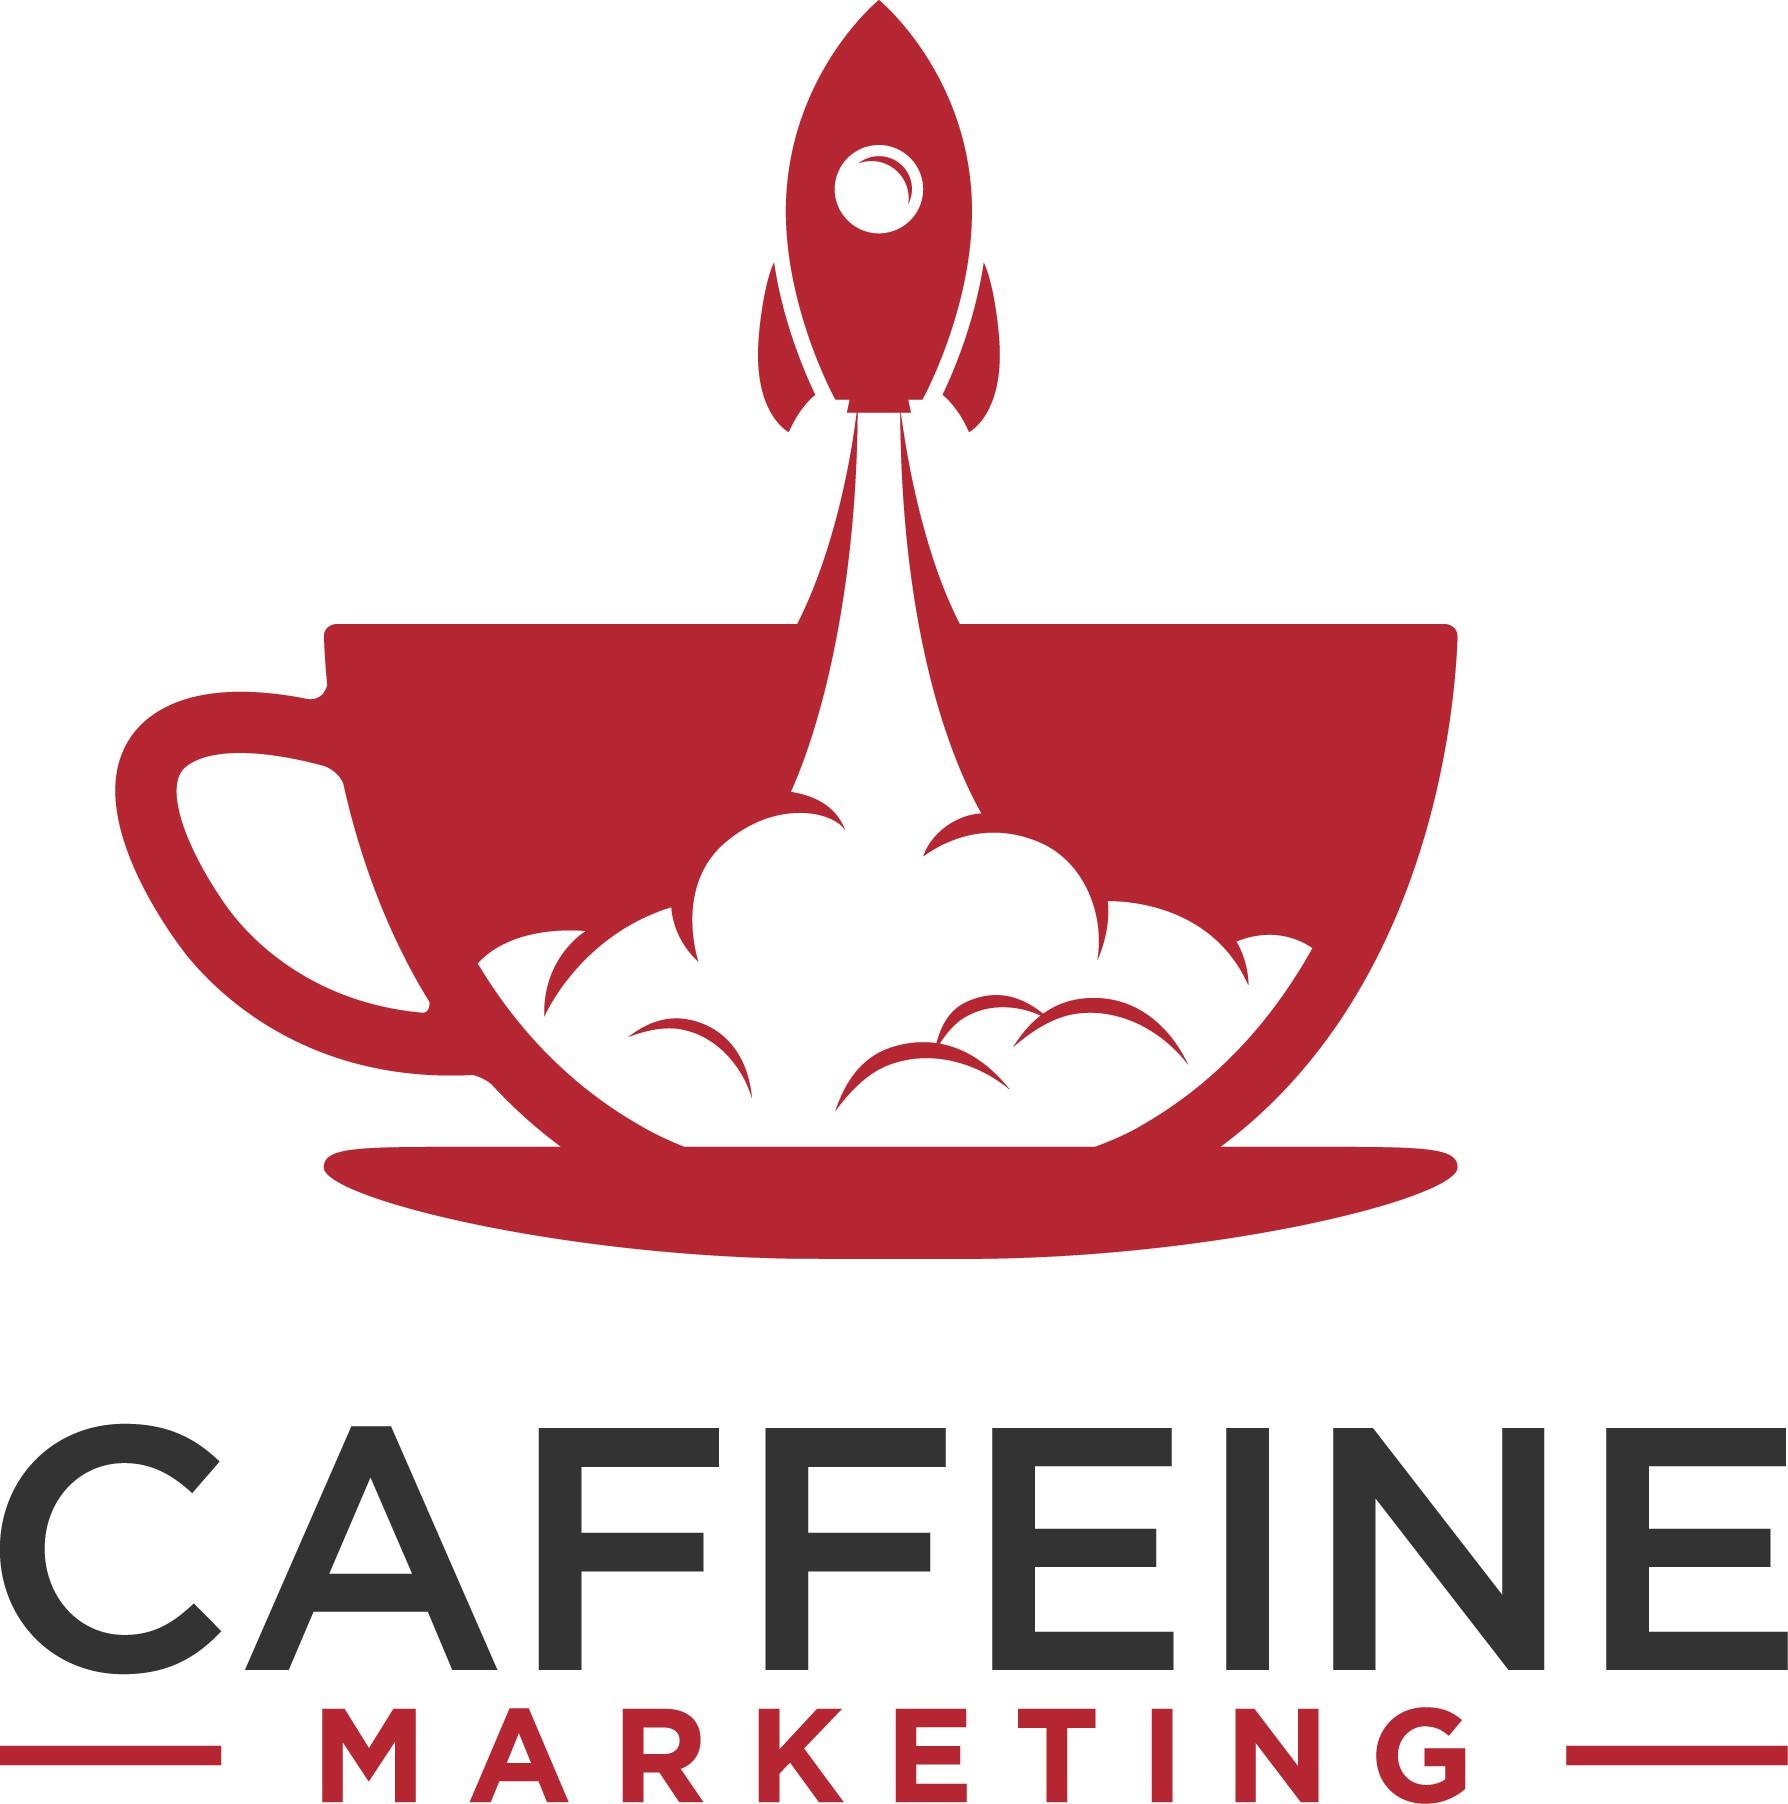 Design a trendy logo for a fun Marketing Agency rebrand named Caffeine